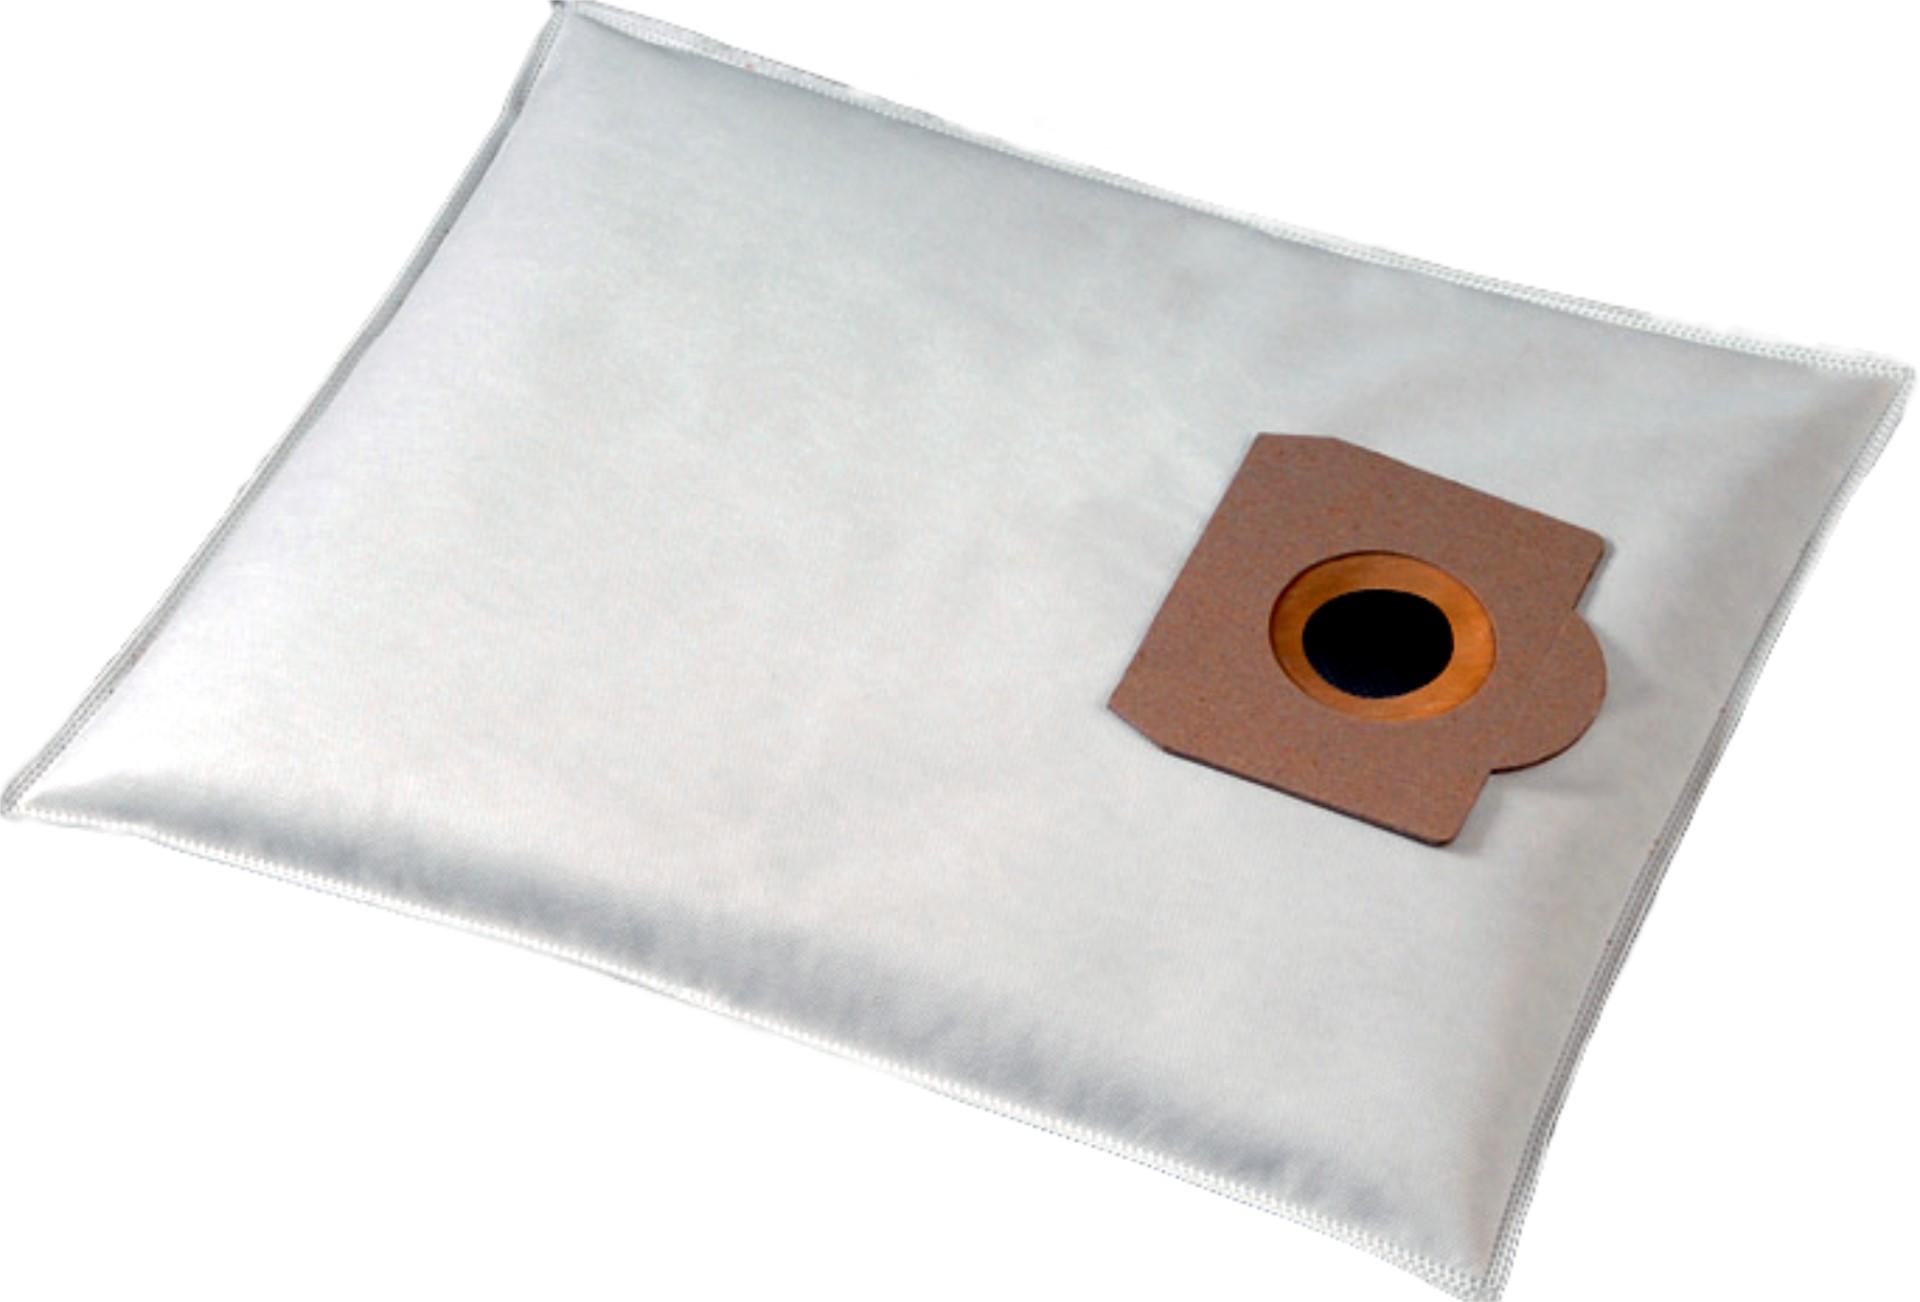 KOMA sáčky ETA Neptun 1404, 3404, Rowenta 0404 textilní, 4ks